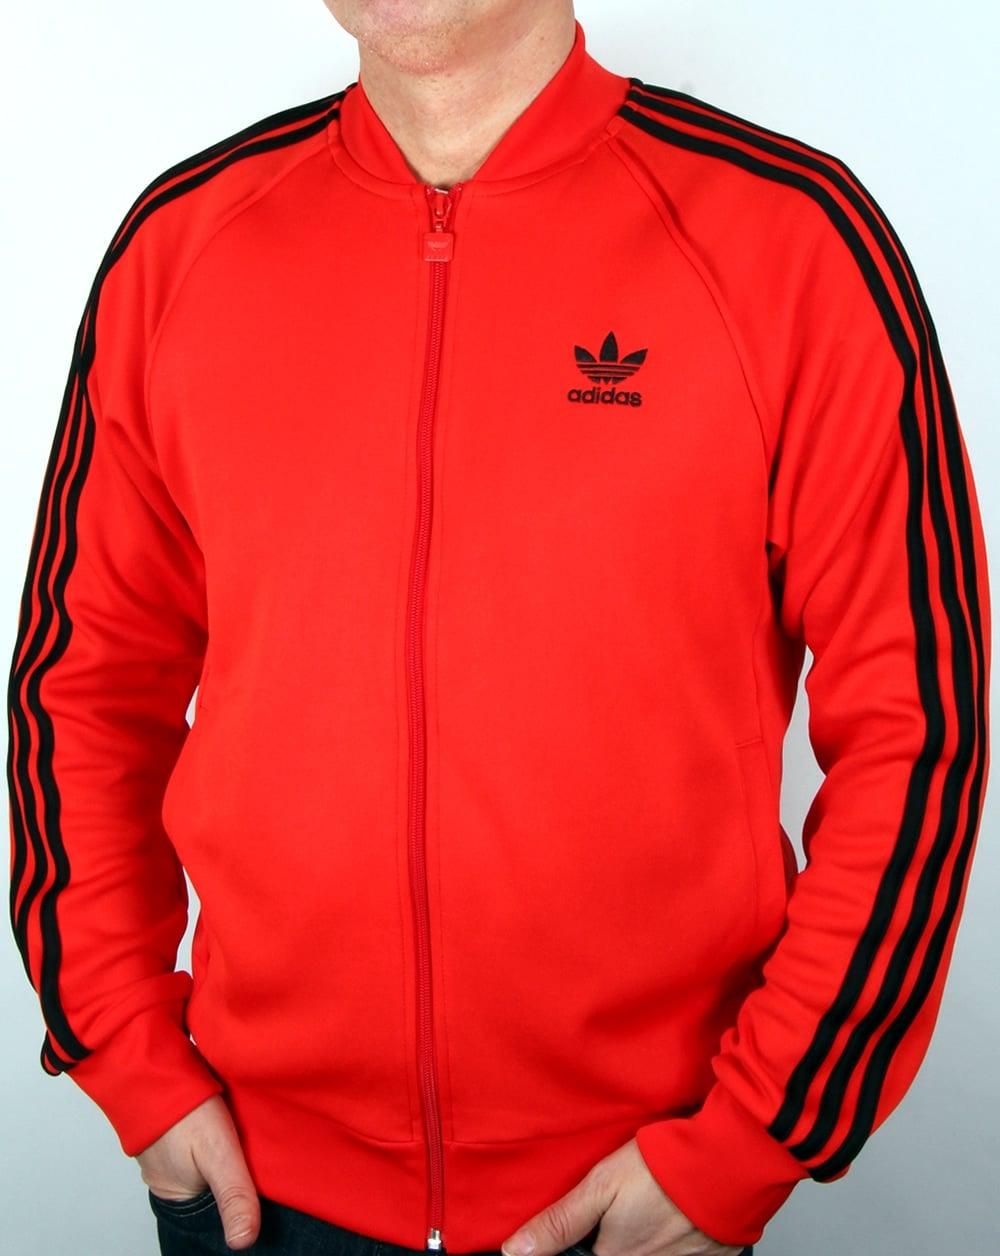 696136bc351f adidas Originals Adidas Originals Superstar Track Top Core Red